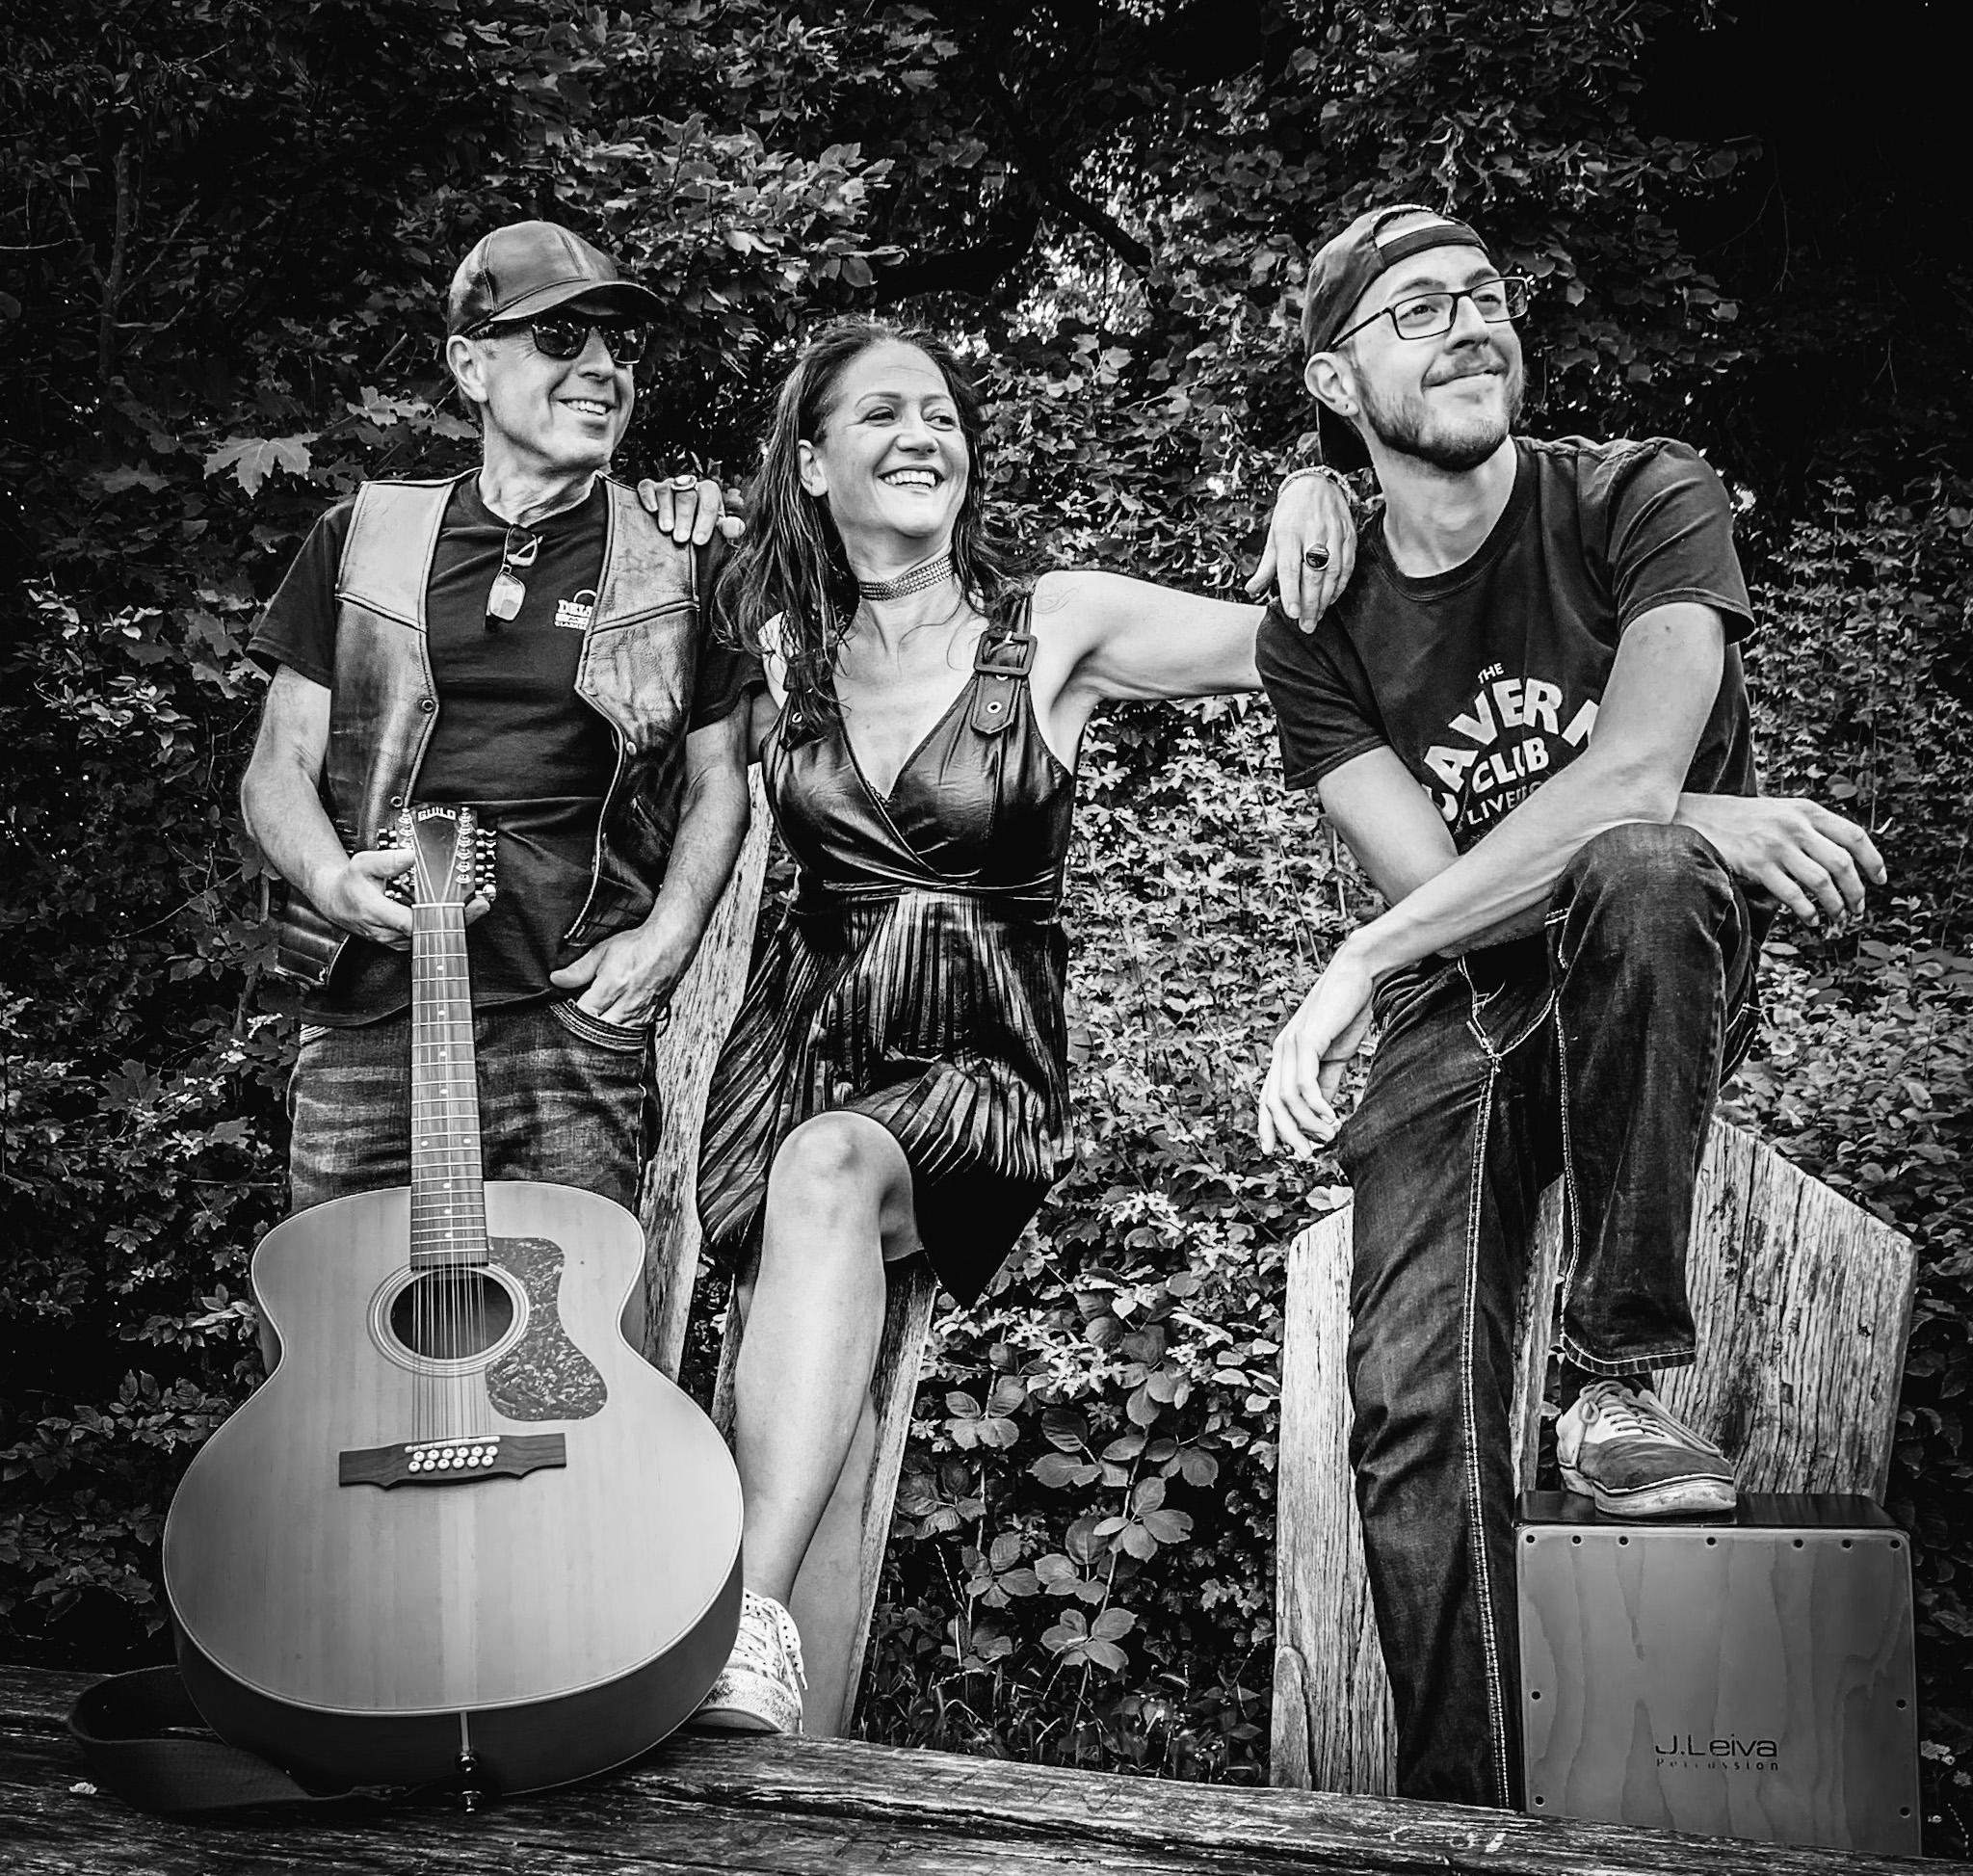 Musik am Treffpunkt Seehofpark mit 3Motion